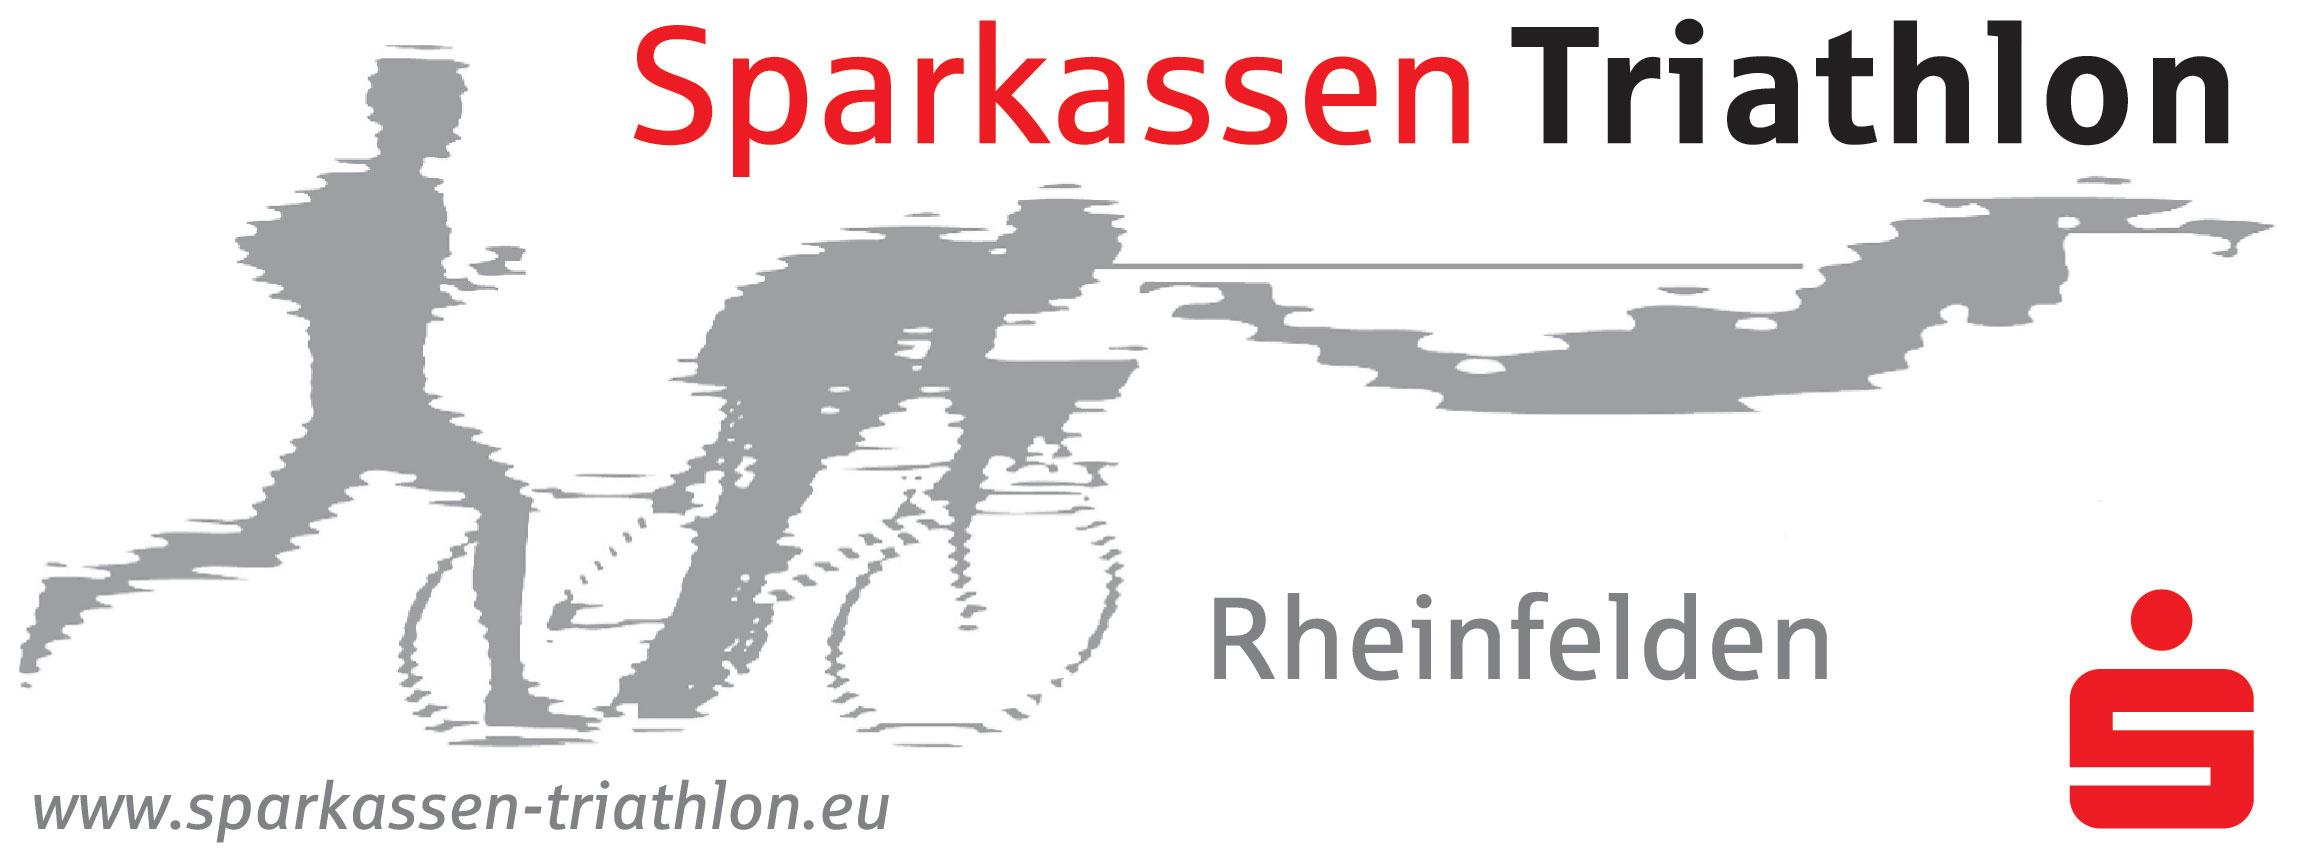 sparkassen-triathlon-logo